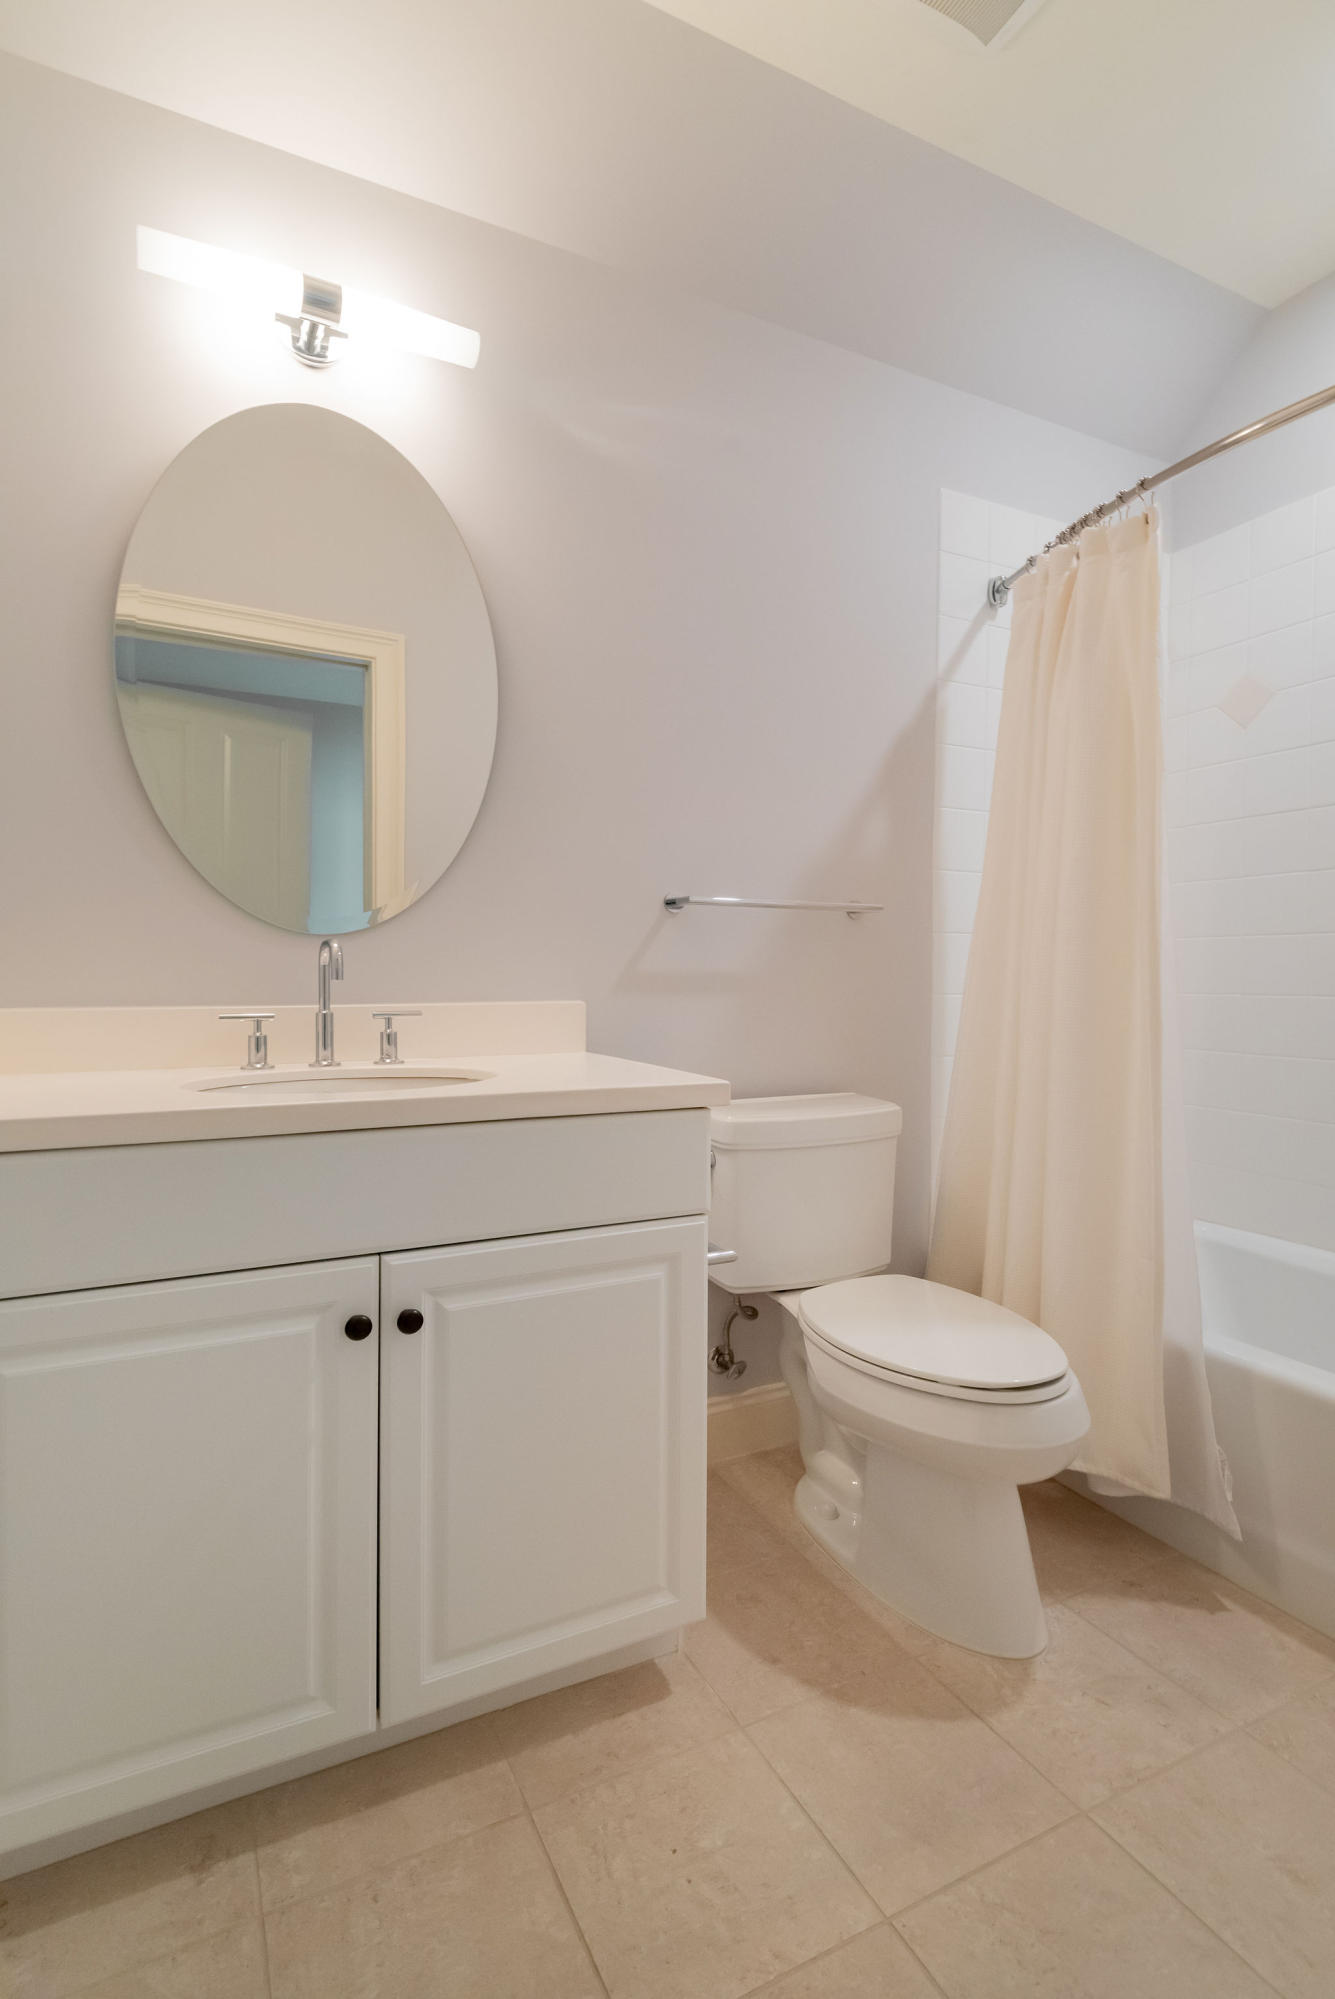 Kiawah Island Homes For Sale - 3 Grey Widgeon, Kiawah Island, SC - 30